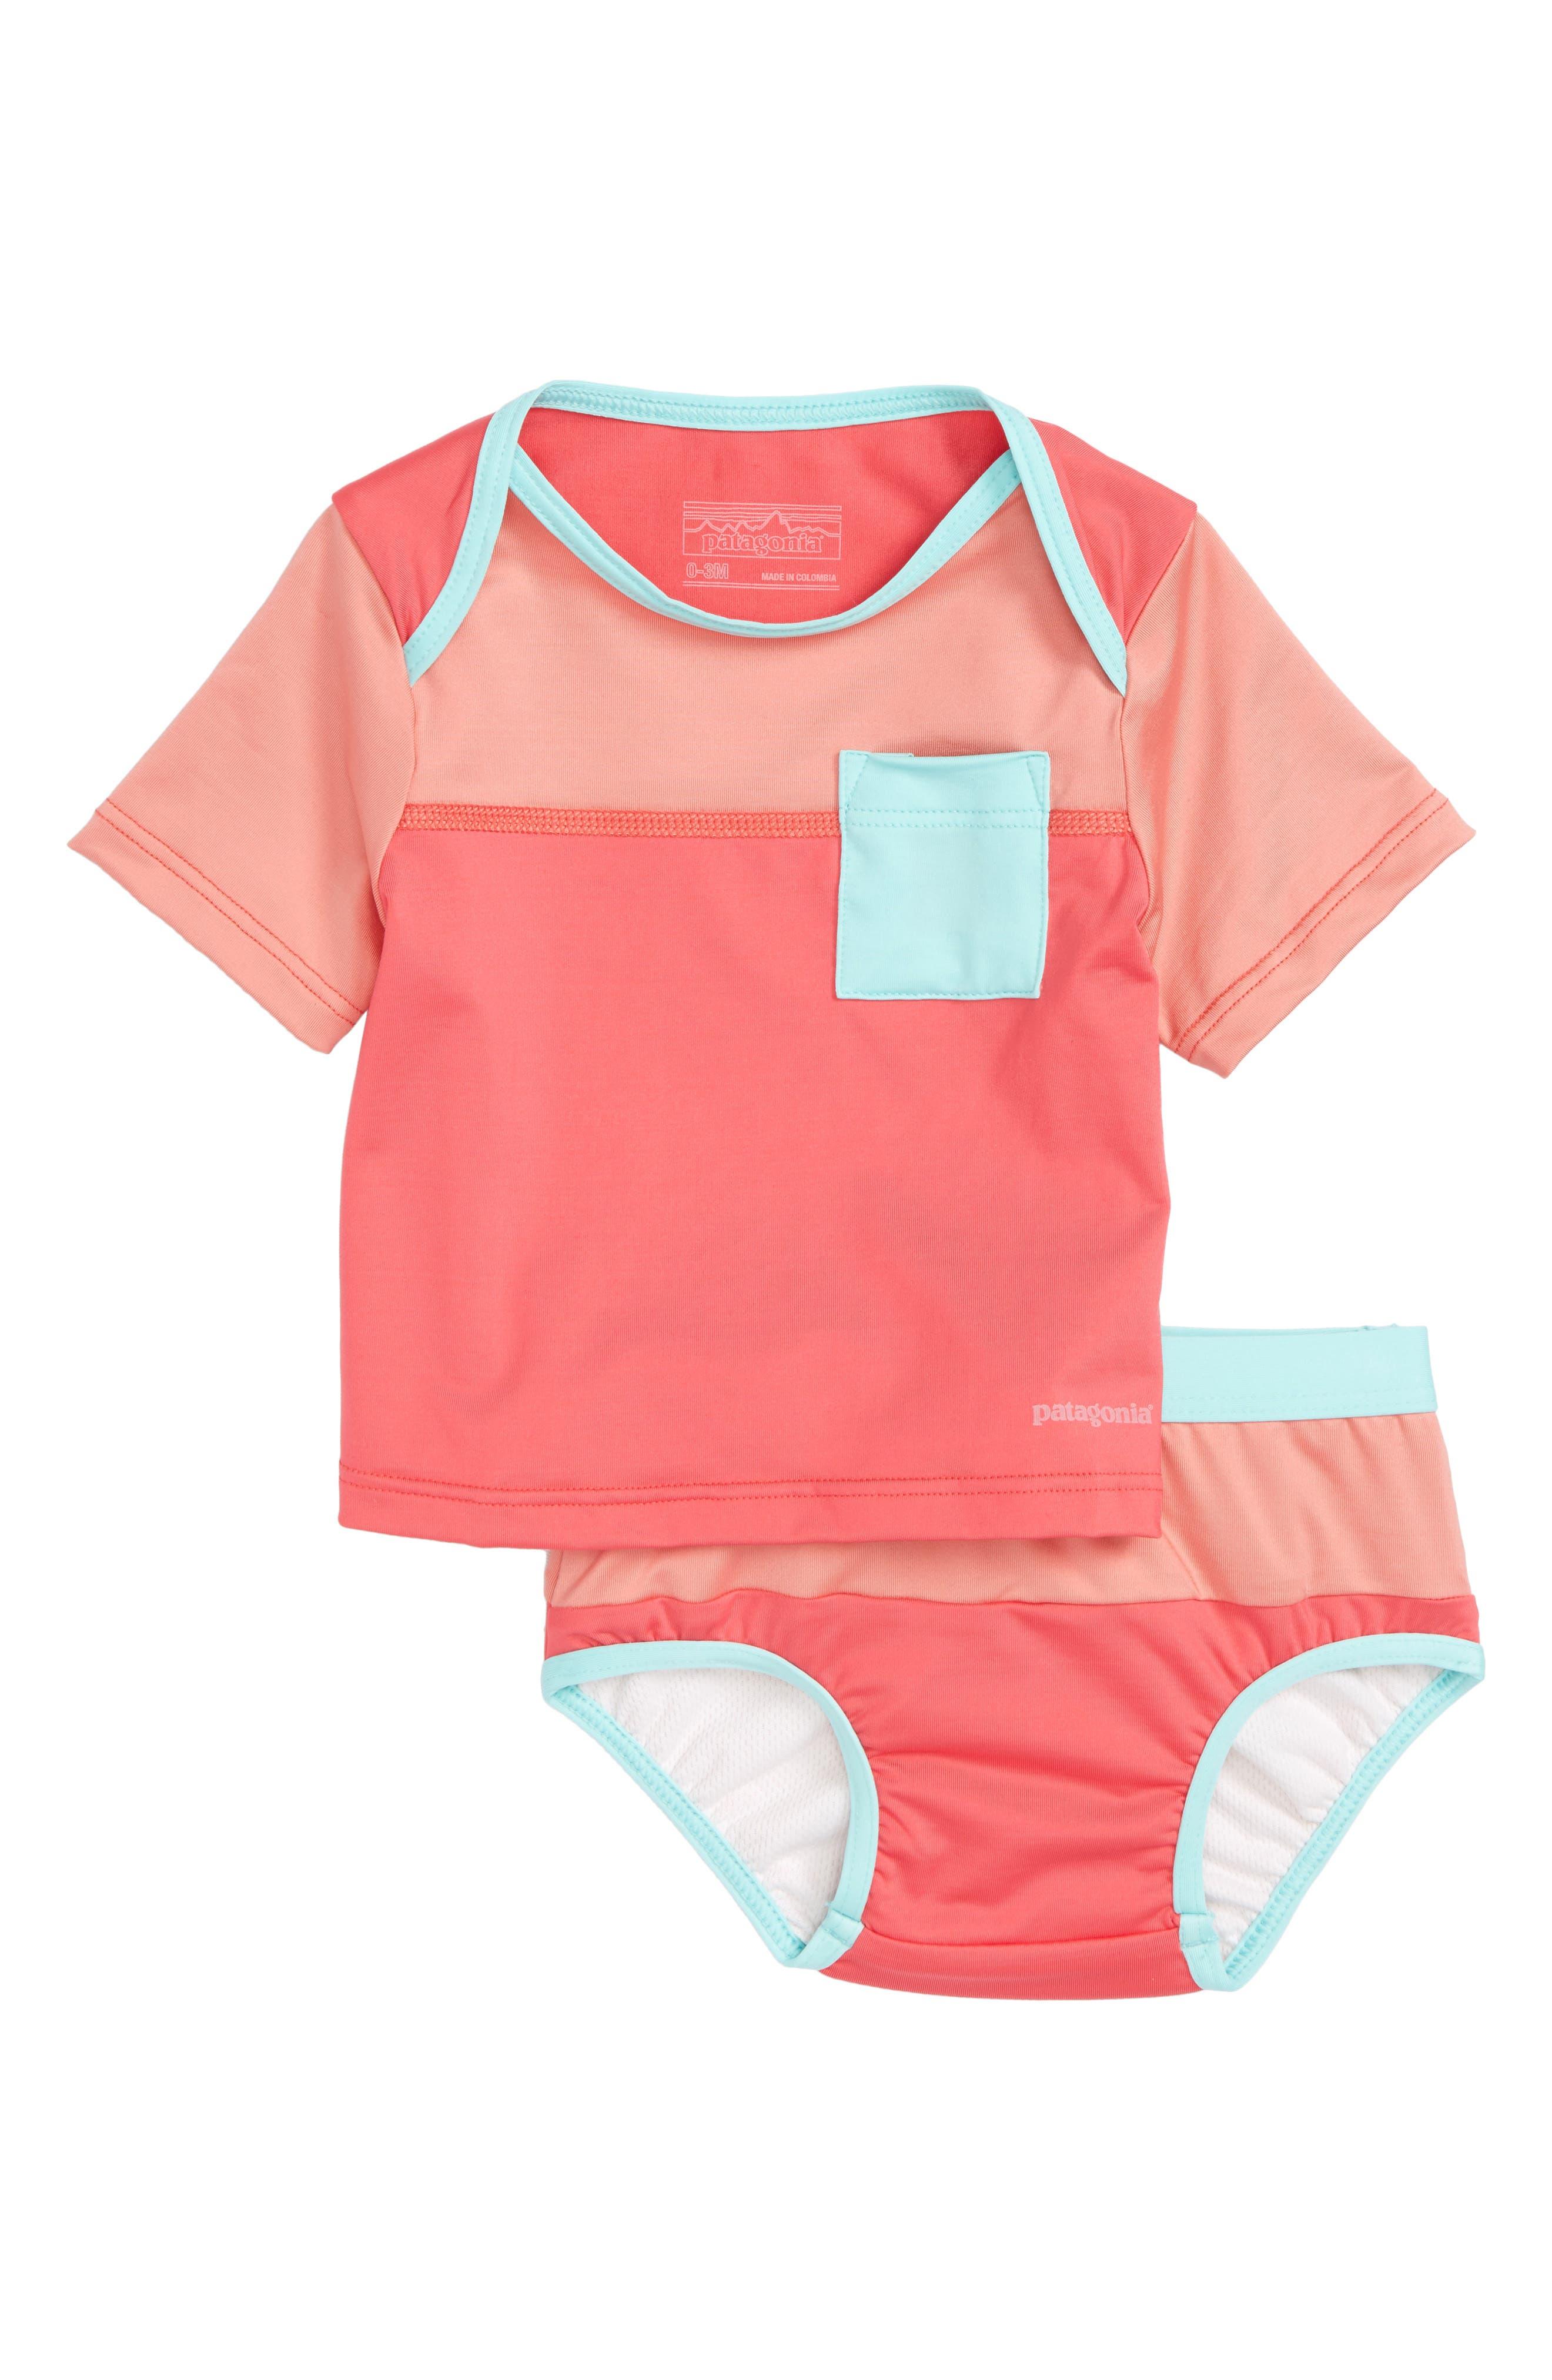 Main Image - Patagonia 'Little Sol' Two-Piece Rashguard Swimsuit (Baby Girls)